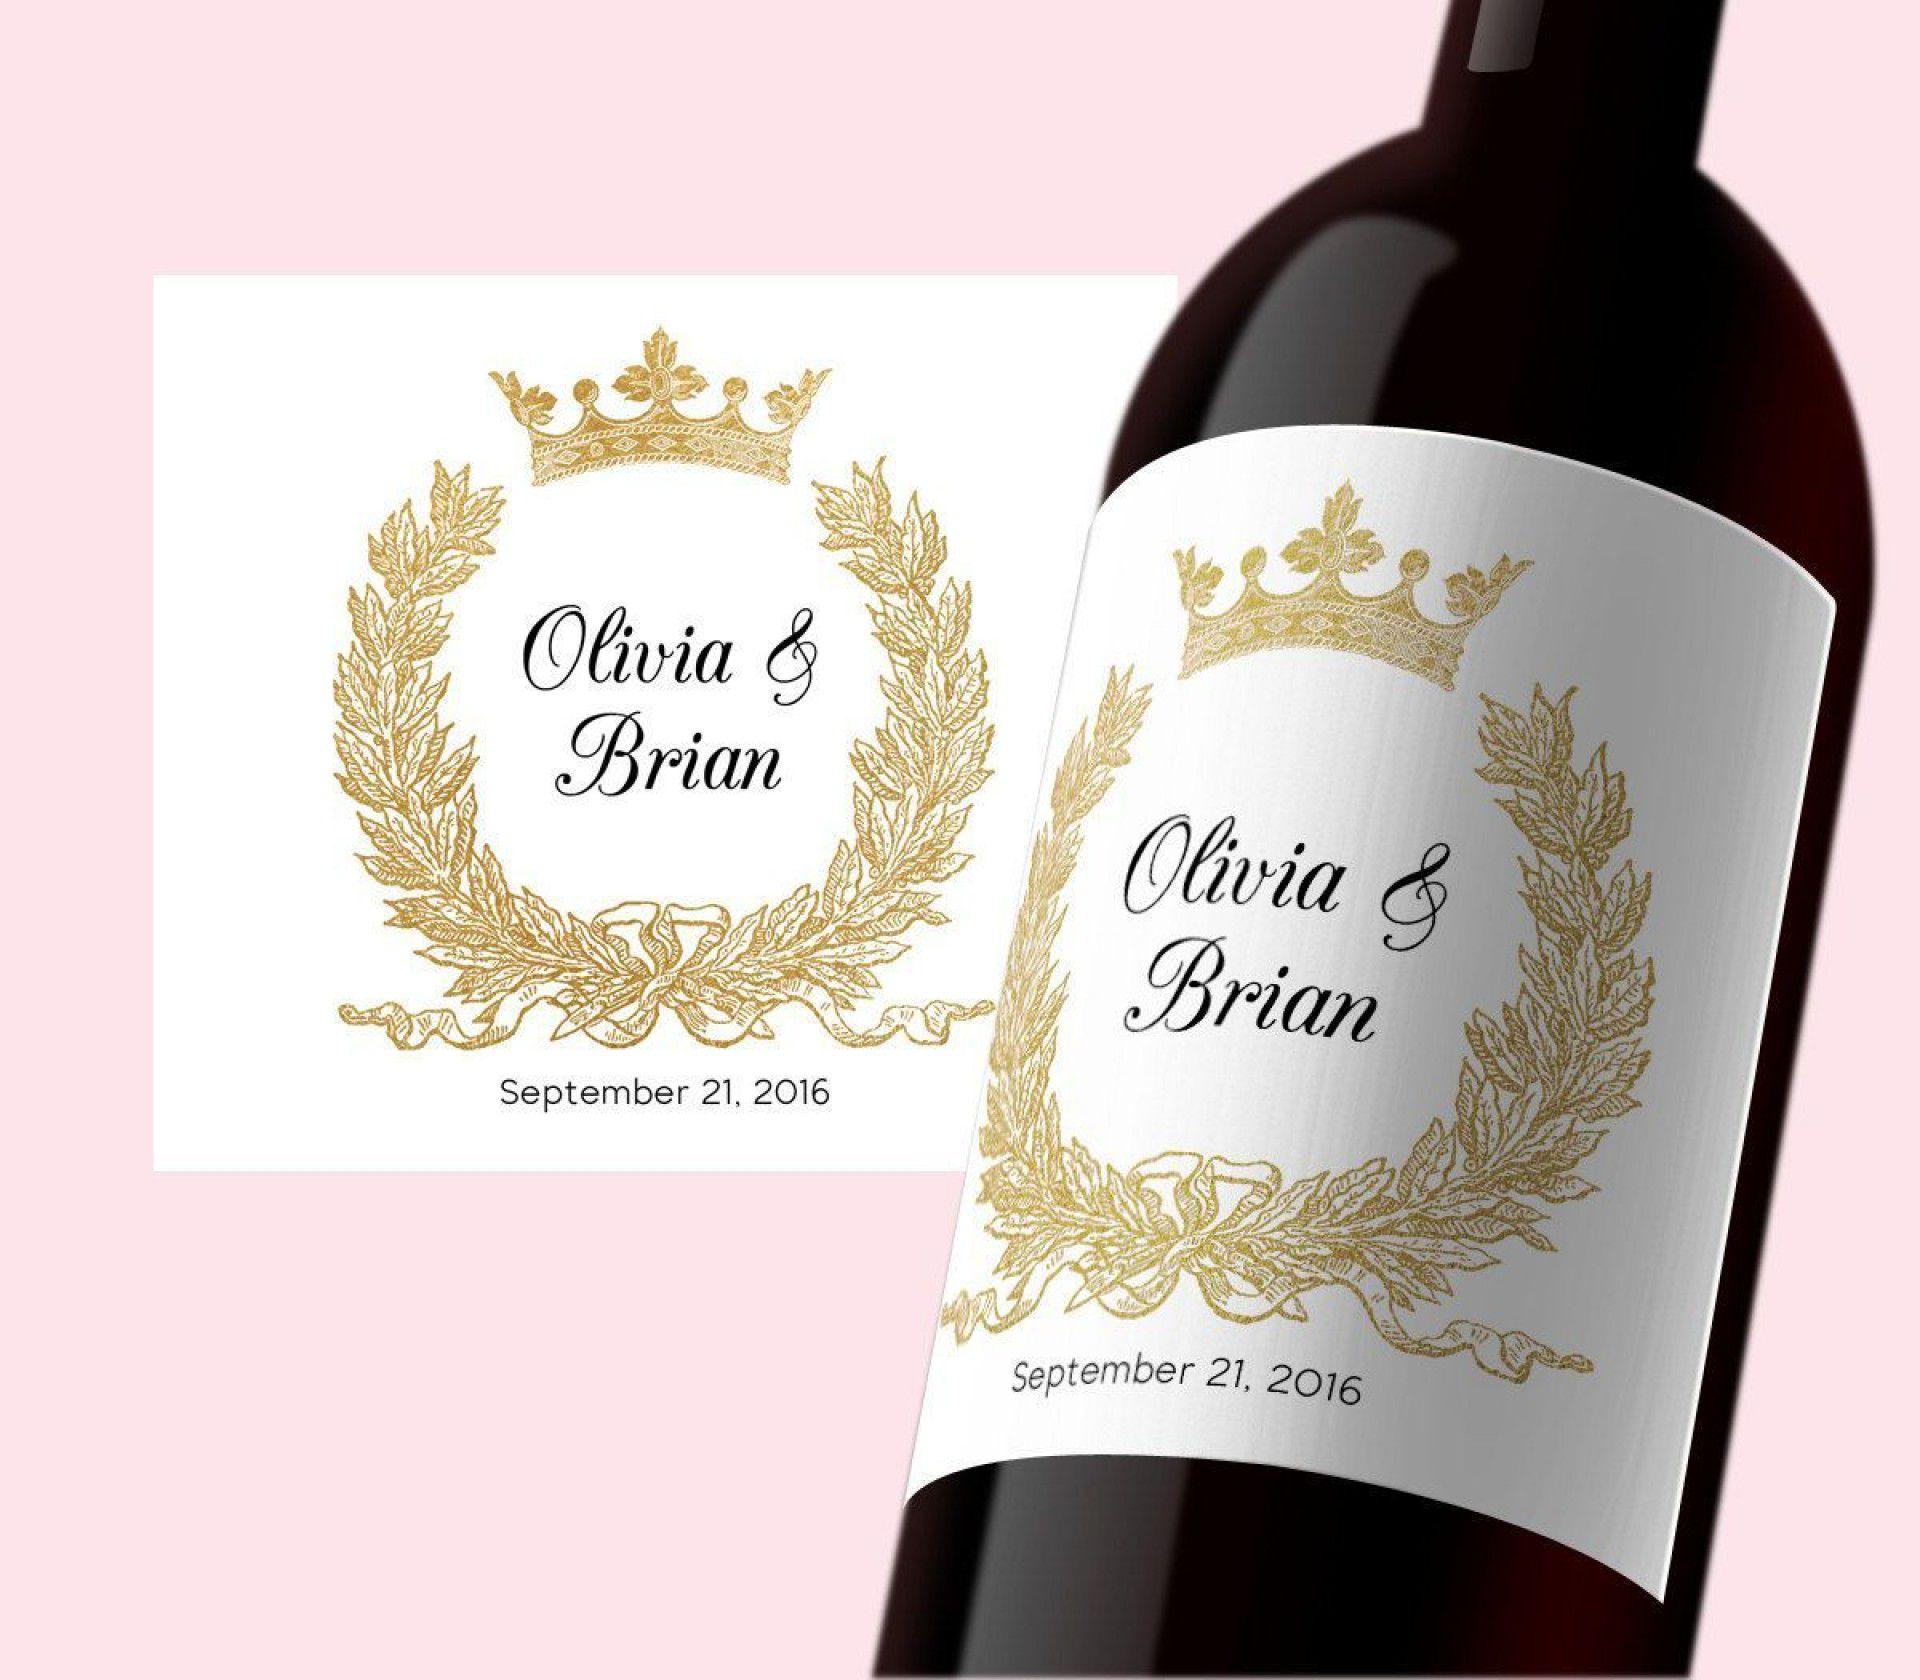 000 Phenomenal Free Wine Bottle Label Template Idea  Mini PrintableFull